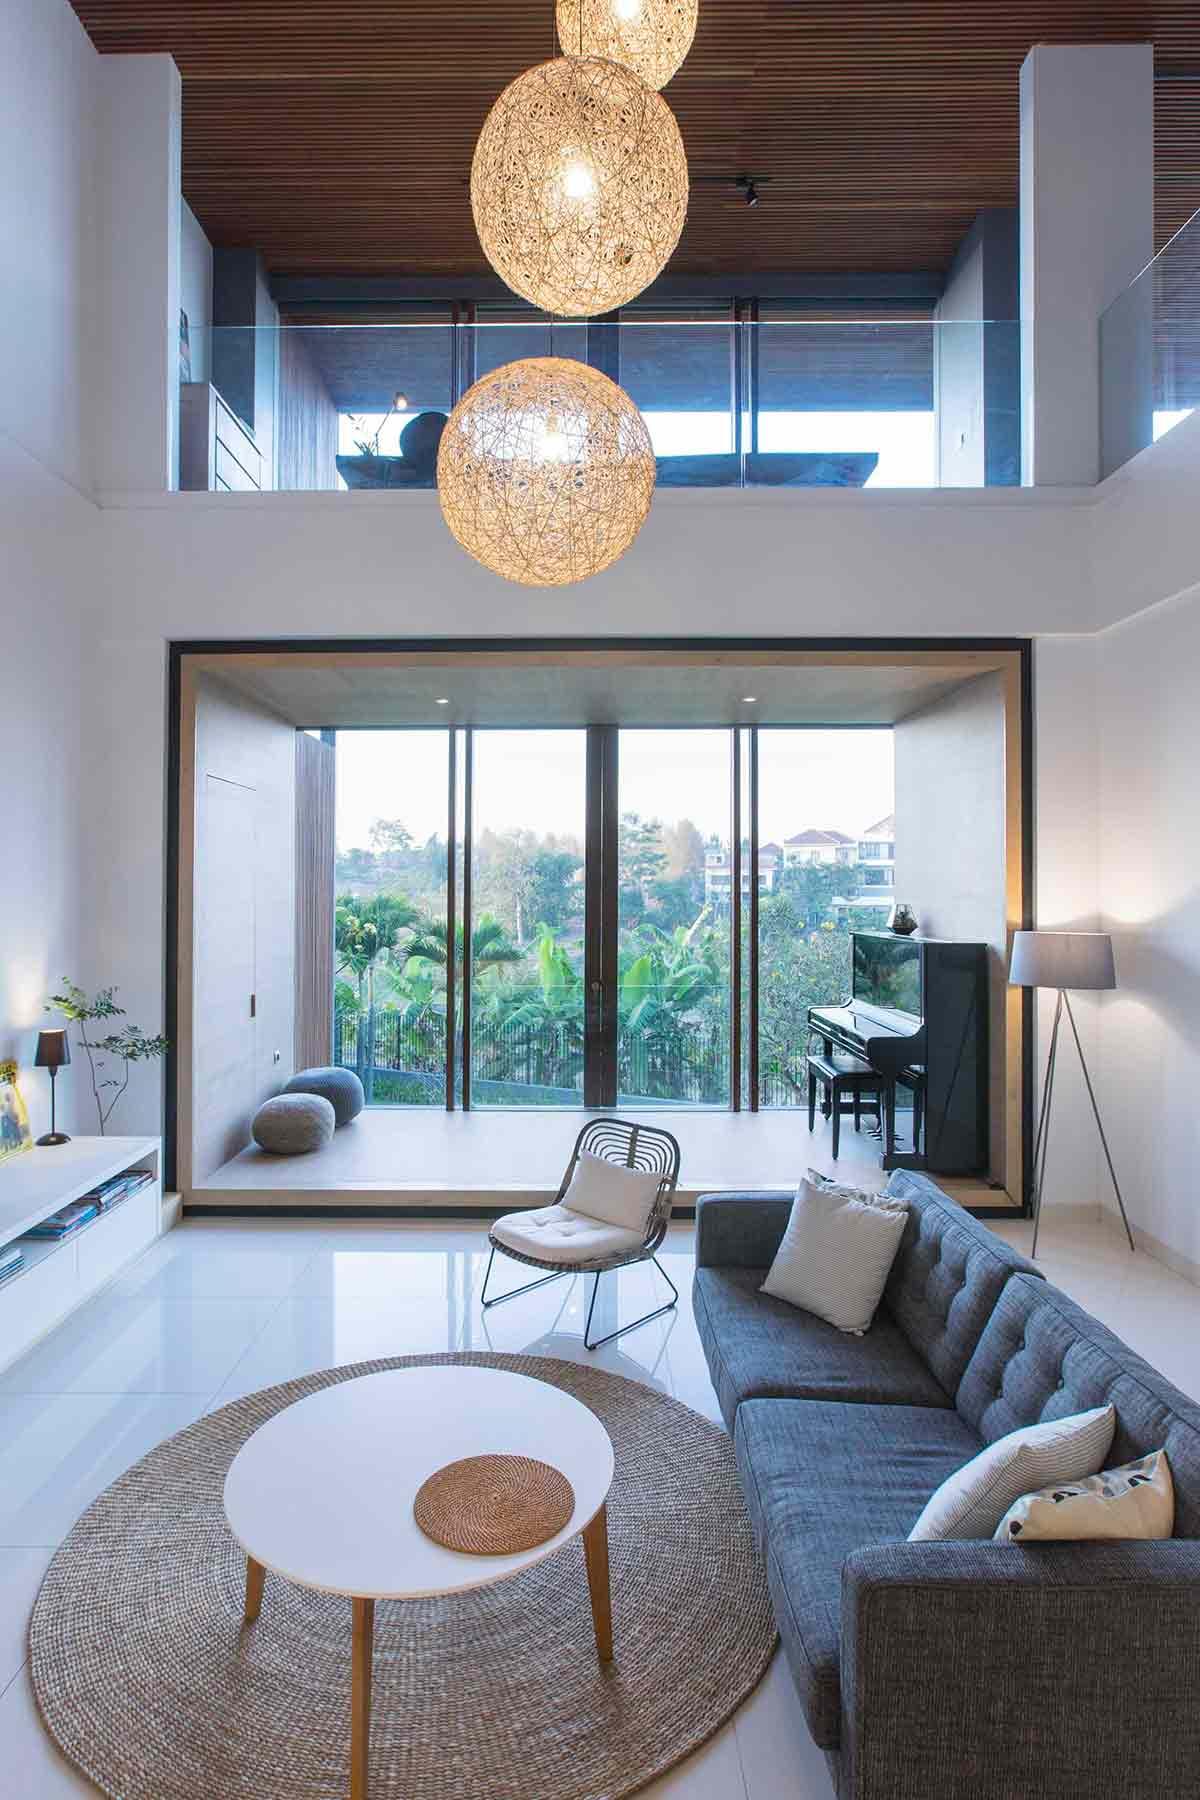 Ruang keluarga minimalis modern di Pitarani House (Sumber: Arsitag.com)